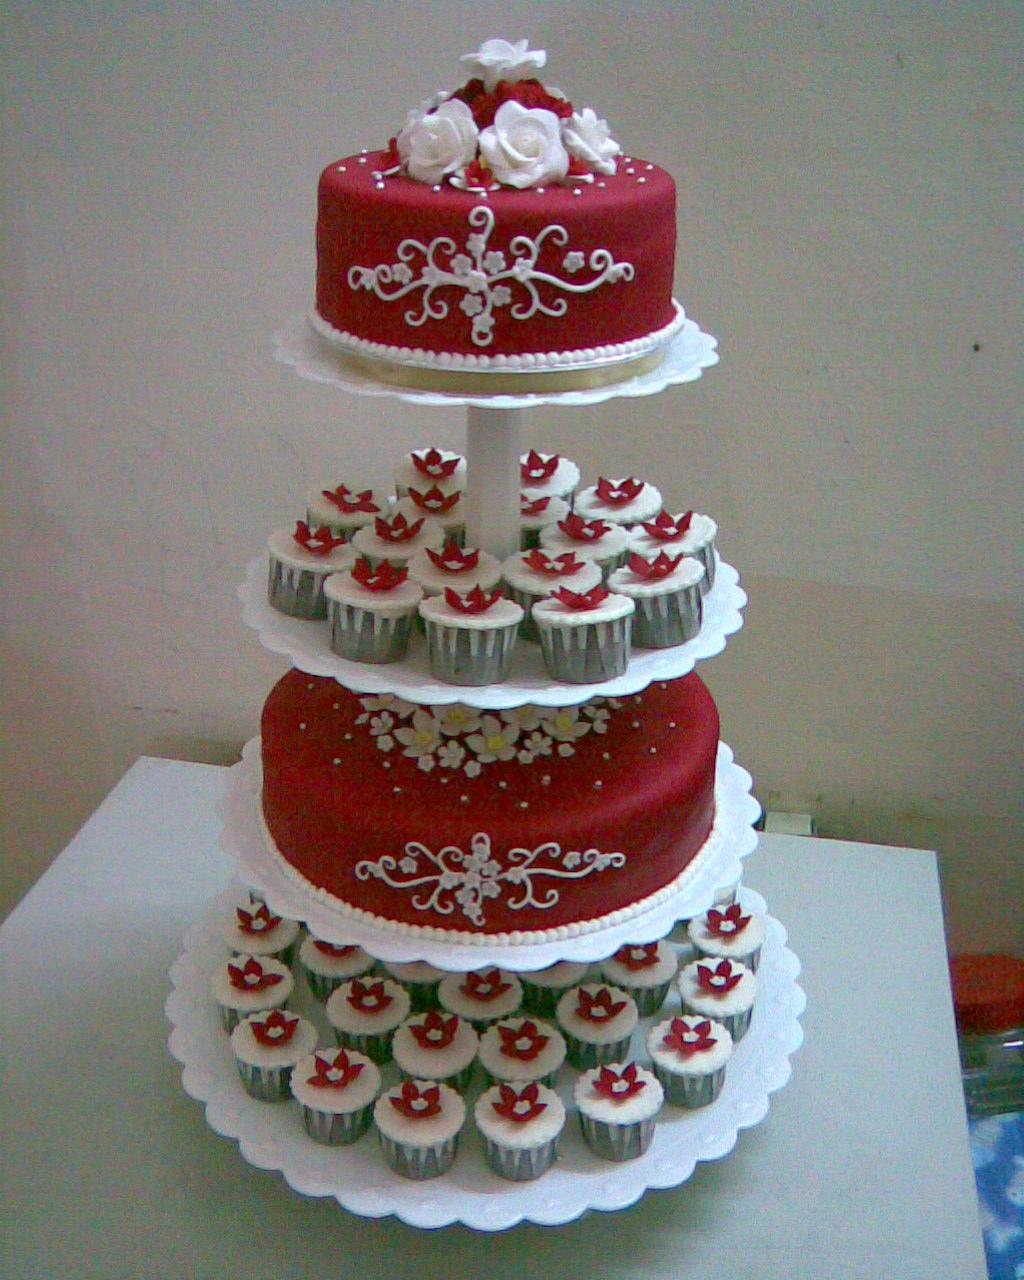 Multy Cuppies Cupcakes Wedding Cupcakes & Cakes